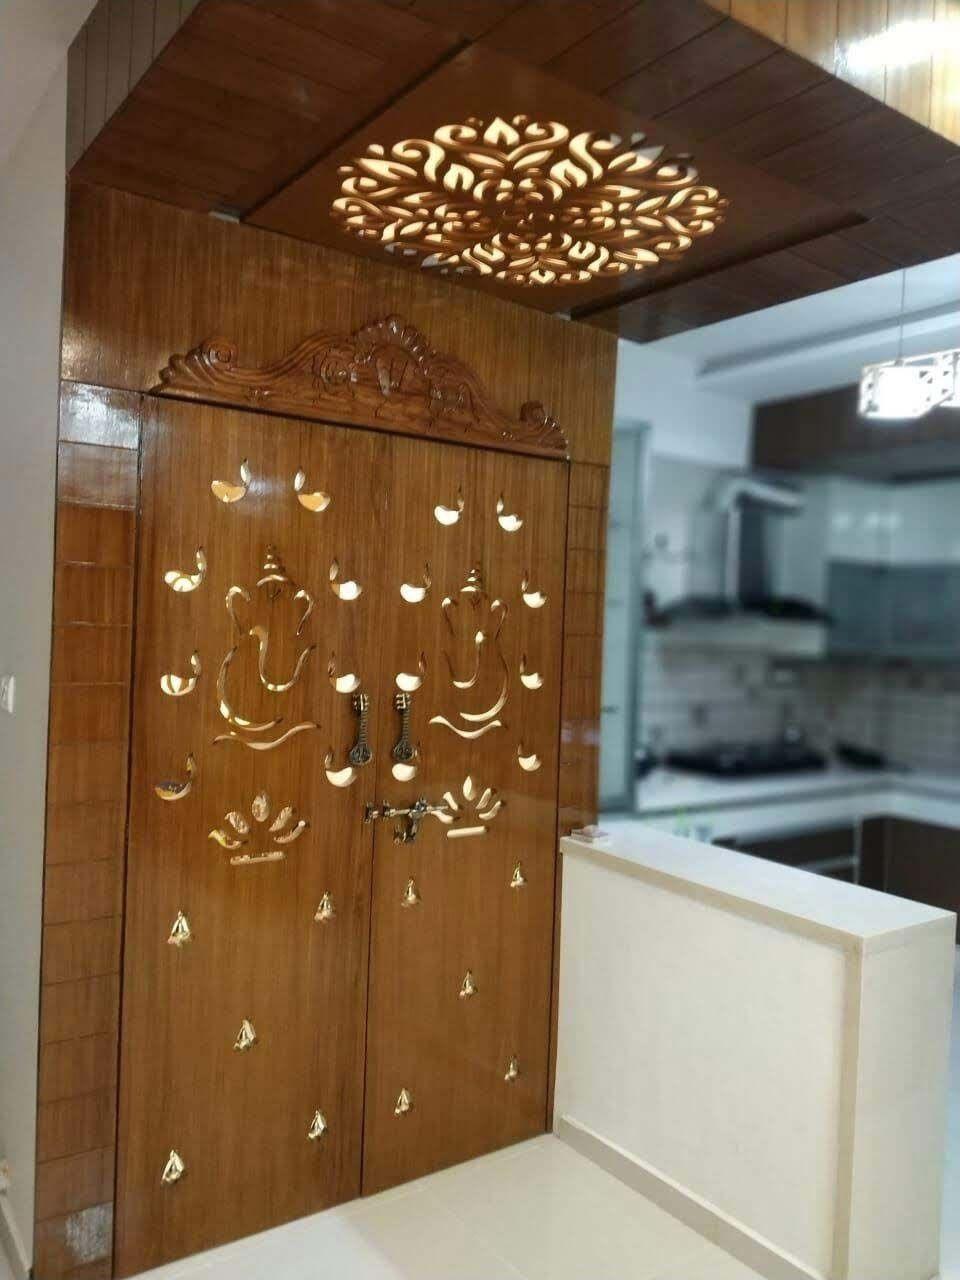 Wooden Entrance For Pooja Room Pooja Room Door Design Pooja Door Design Room Door Design Home simple pooja room door designs